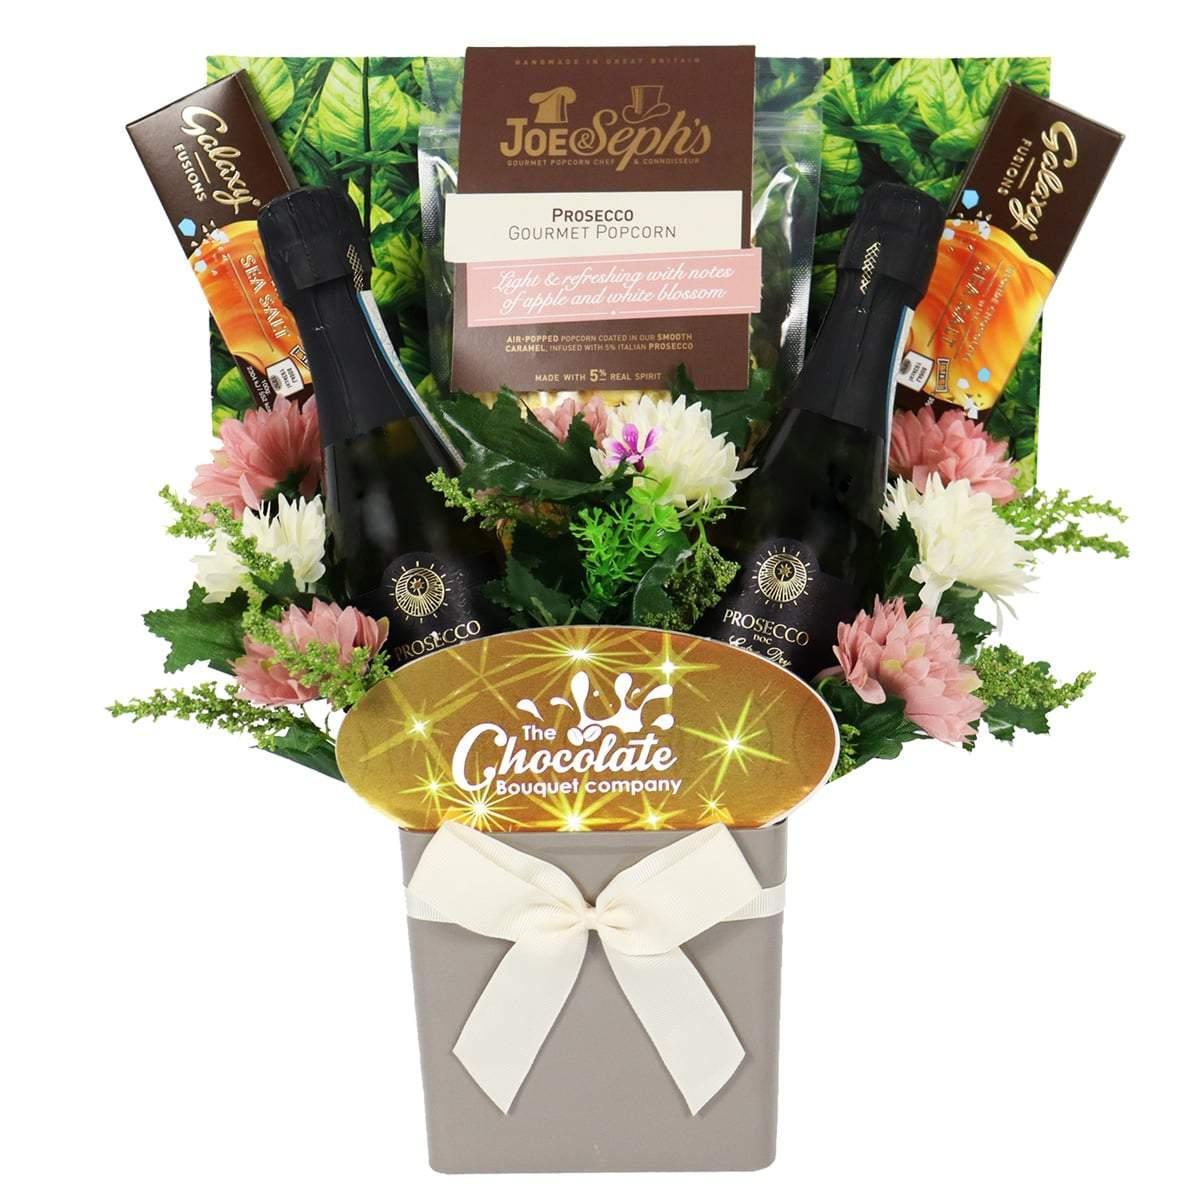 The Prosecco & Chocolate Bouquet